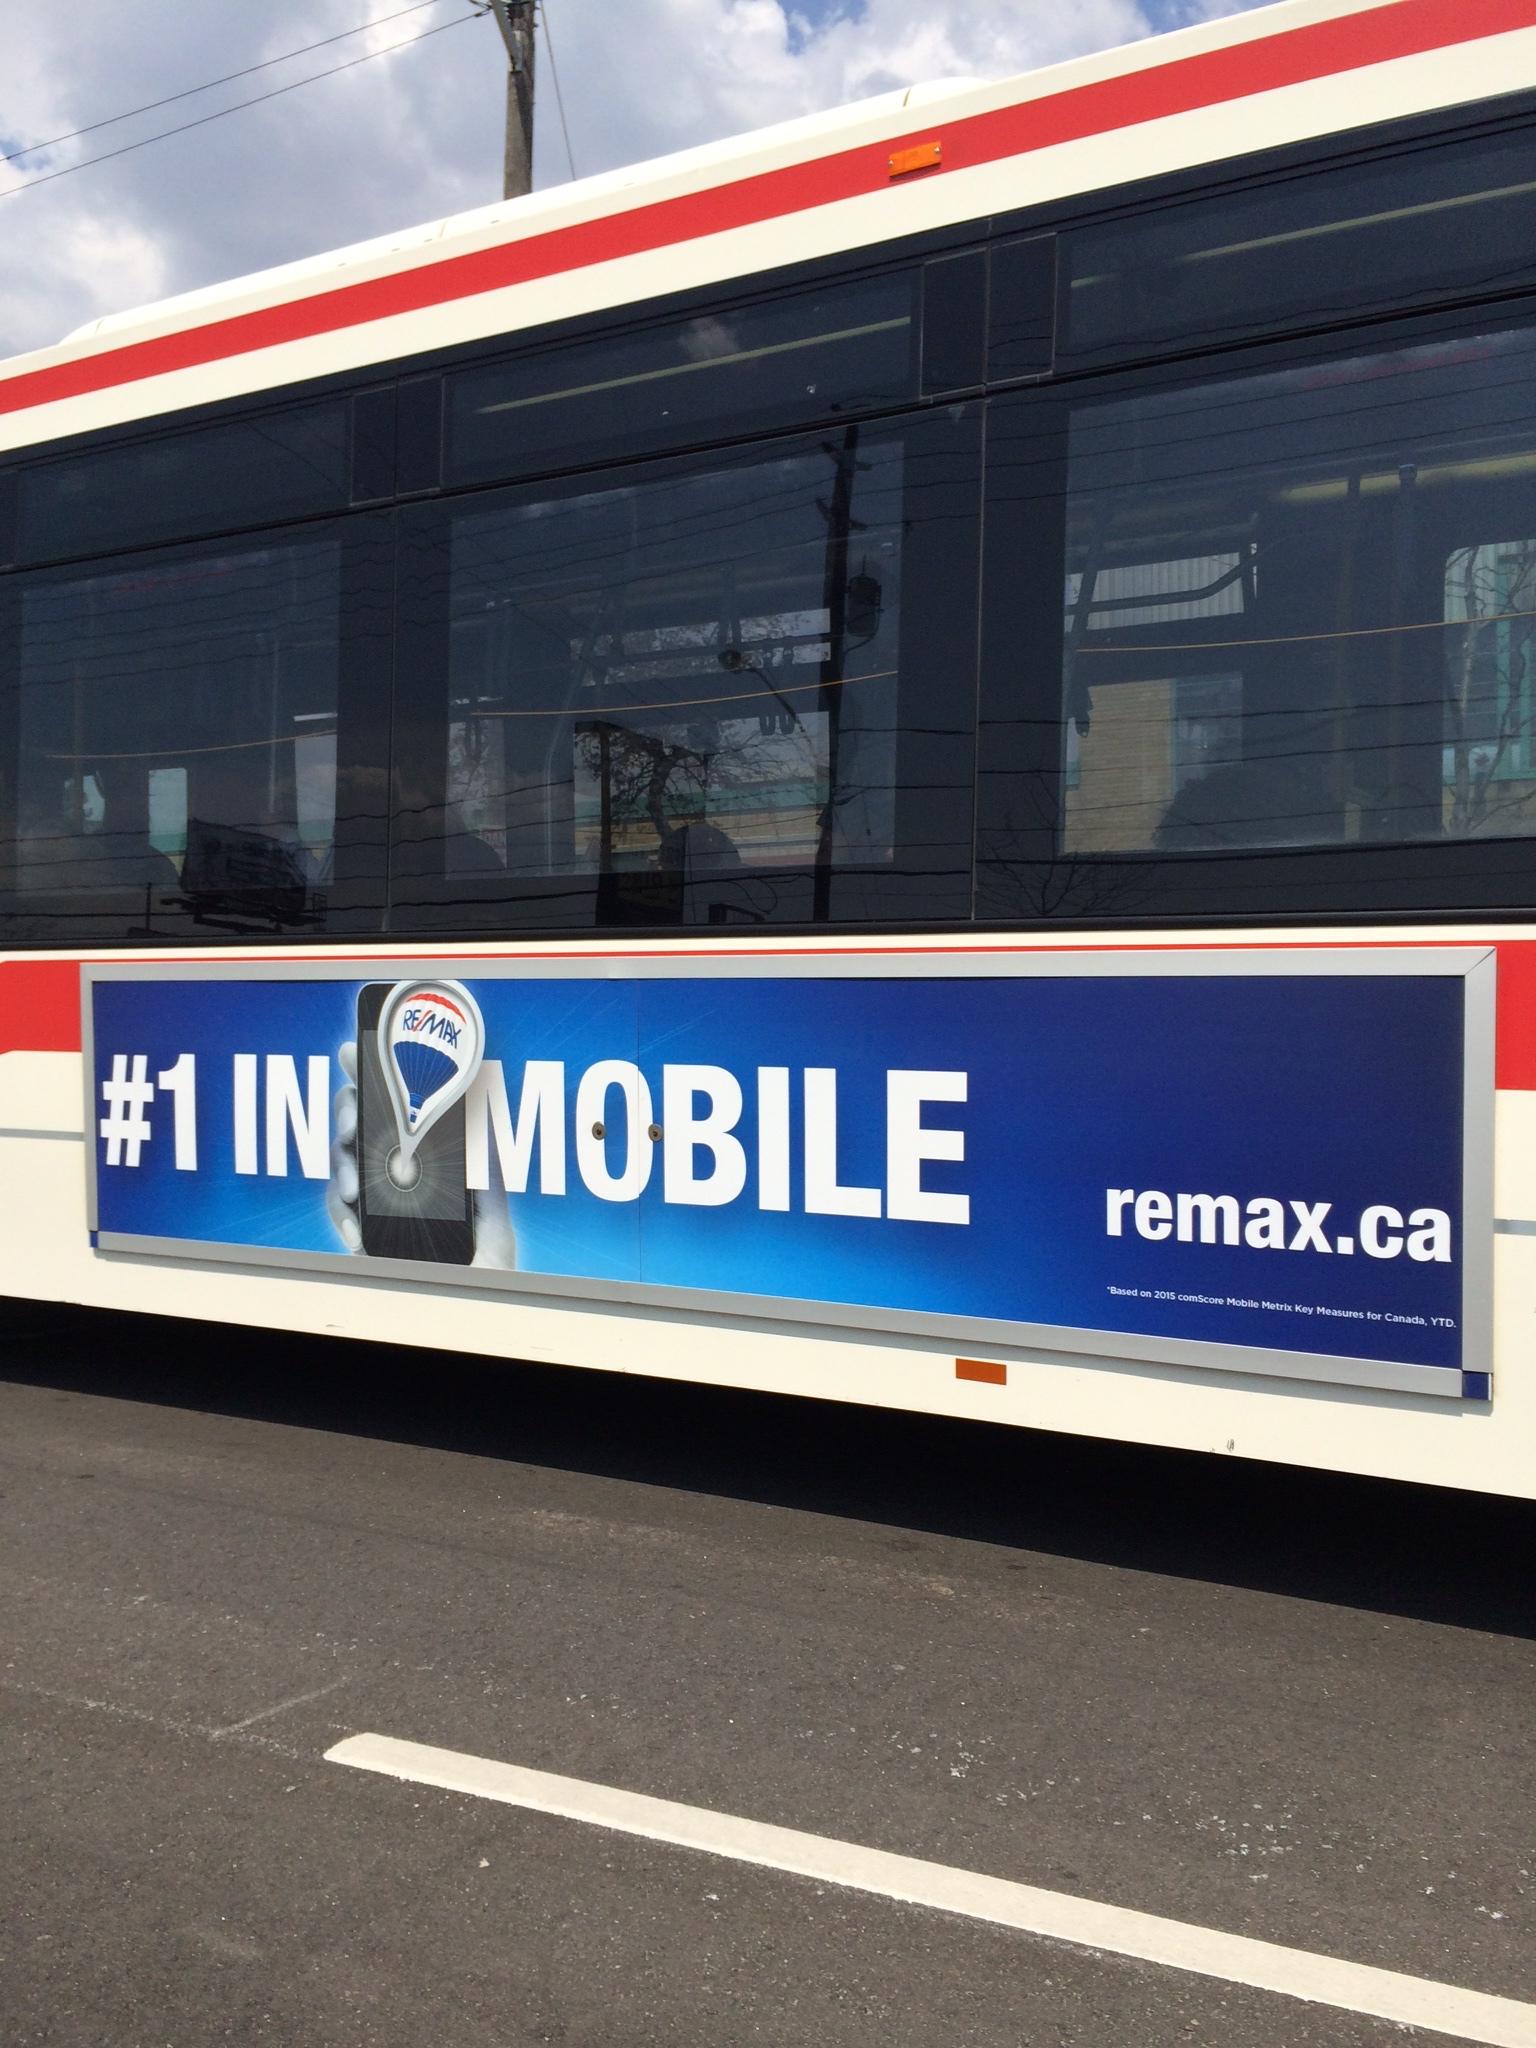 Remax-Mobile No.1.jpg